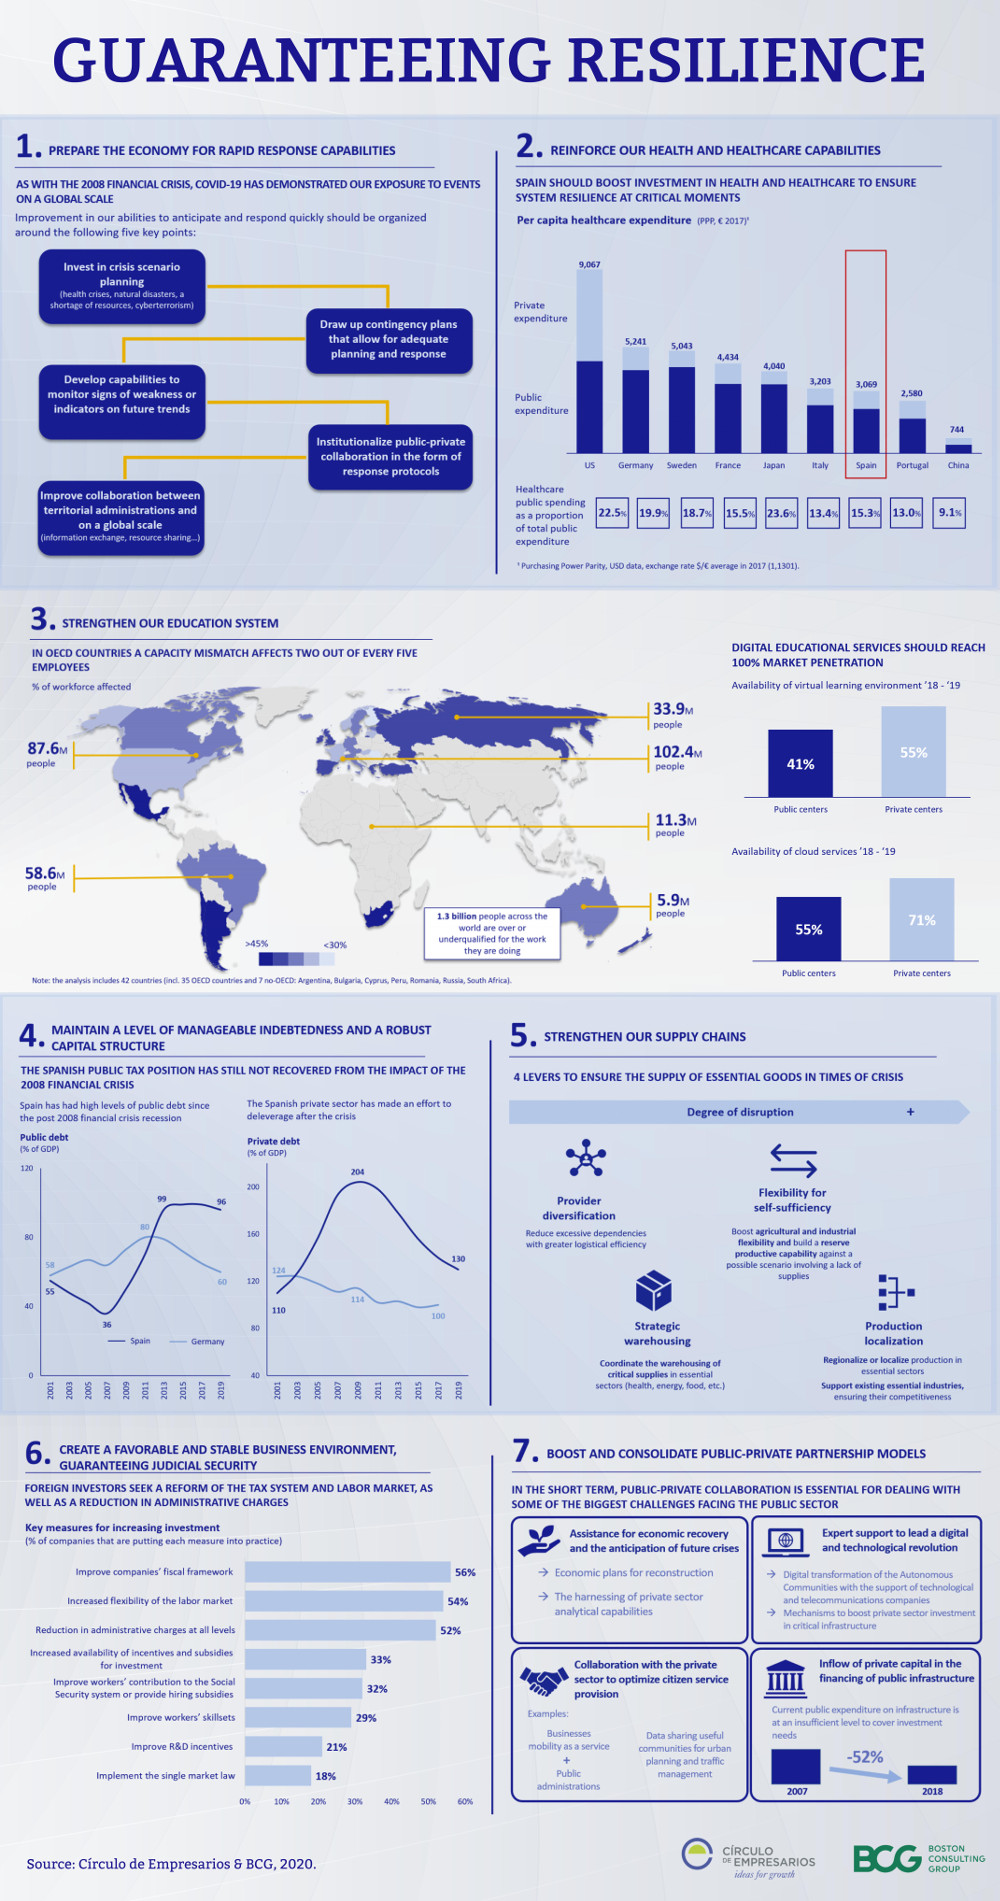 GUARANTEEING-RESILIENCE-infographic-july-2020-Circulo-de-Empresarios